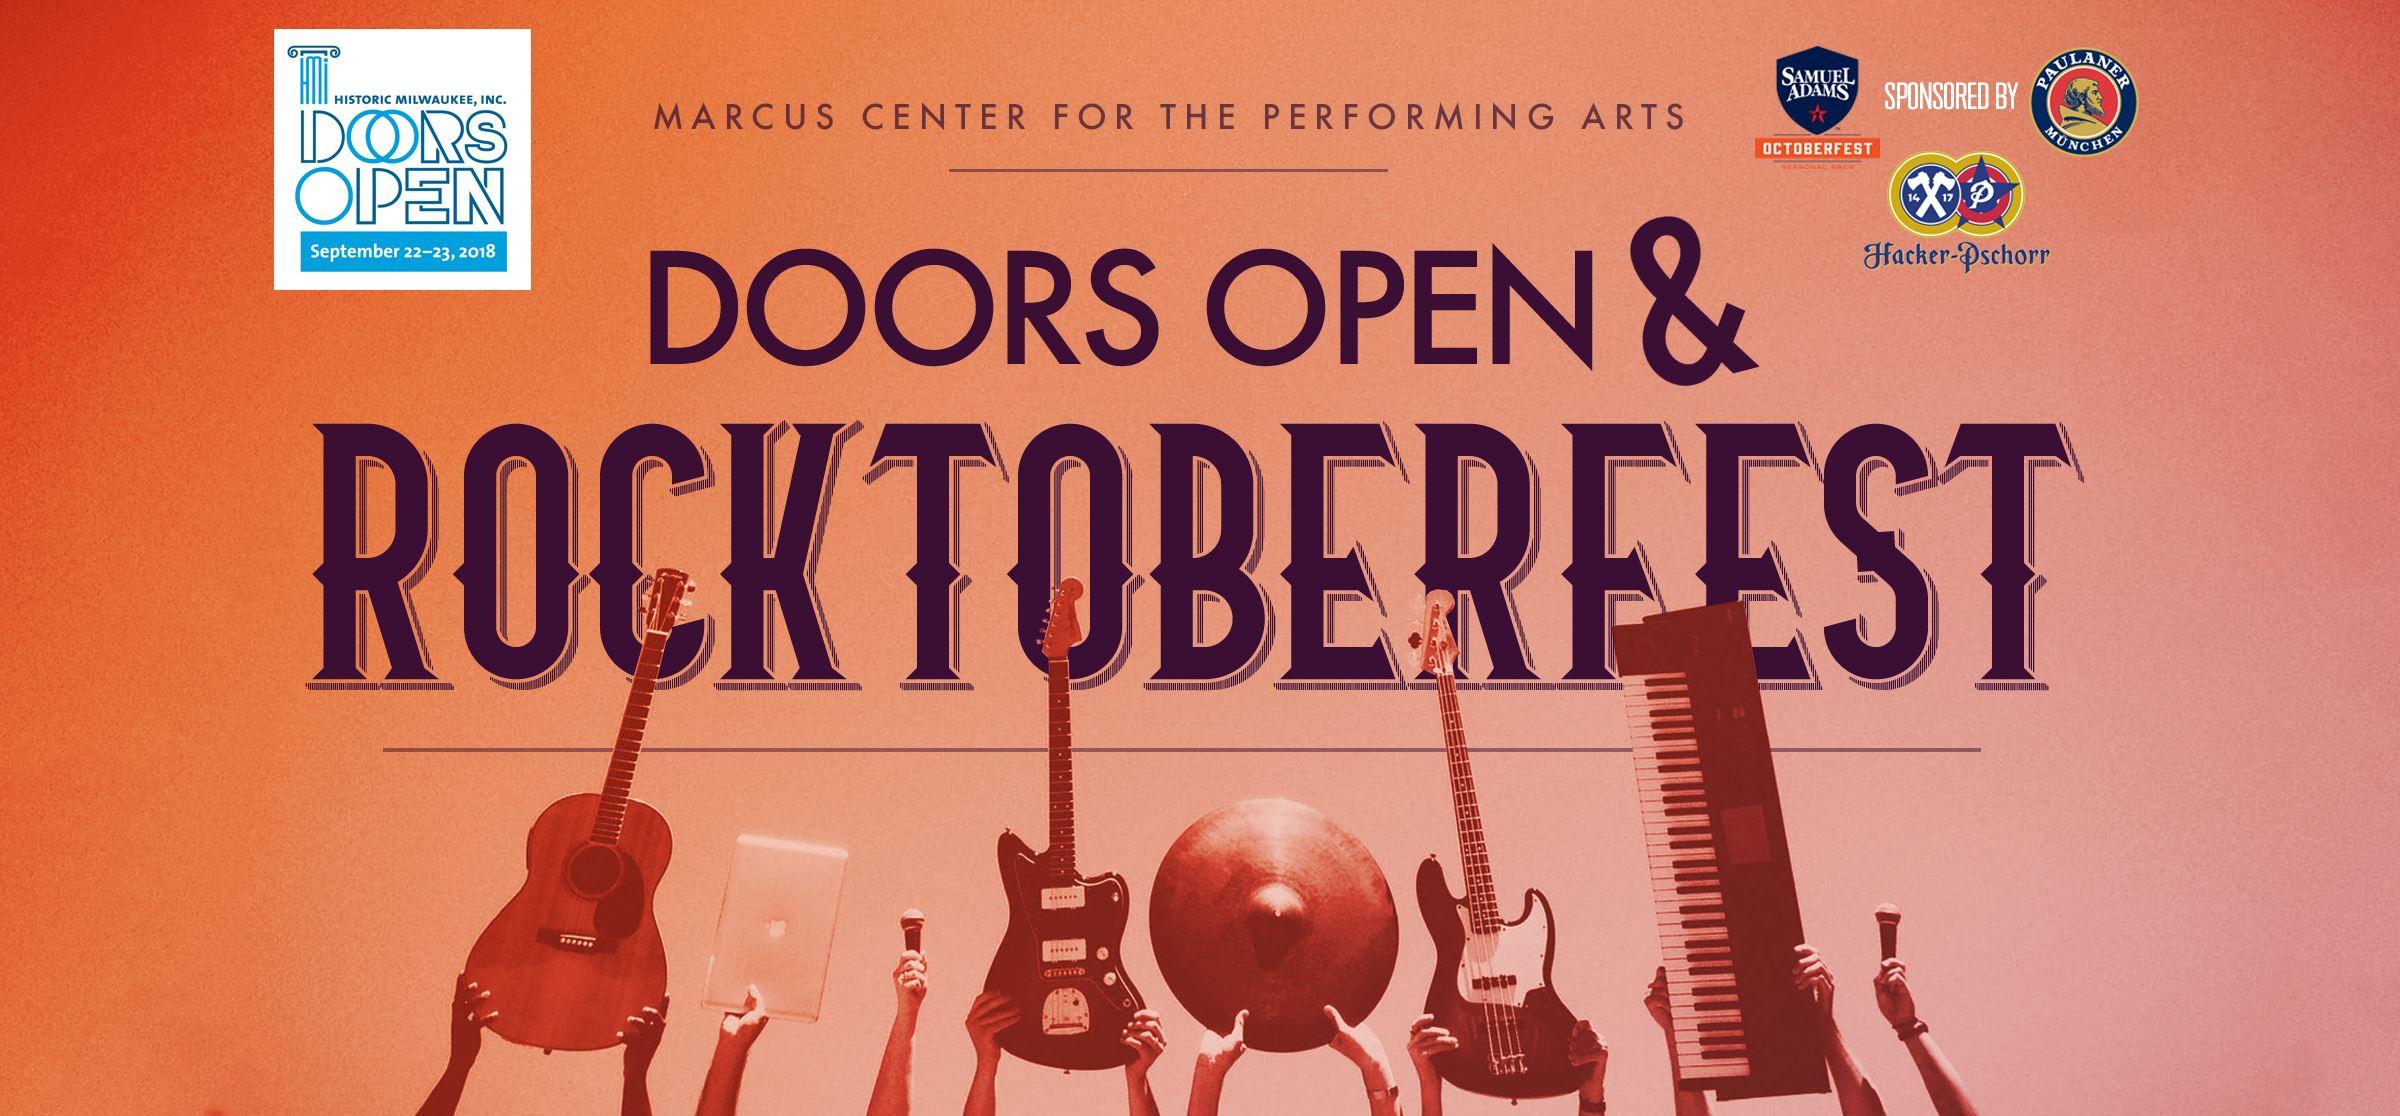 The Marcus Center Hosts ROCKTOBERFEST During Doors Open Milwaukee!